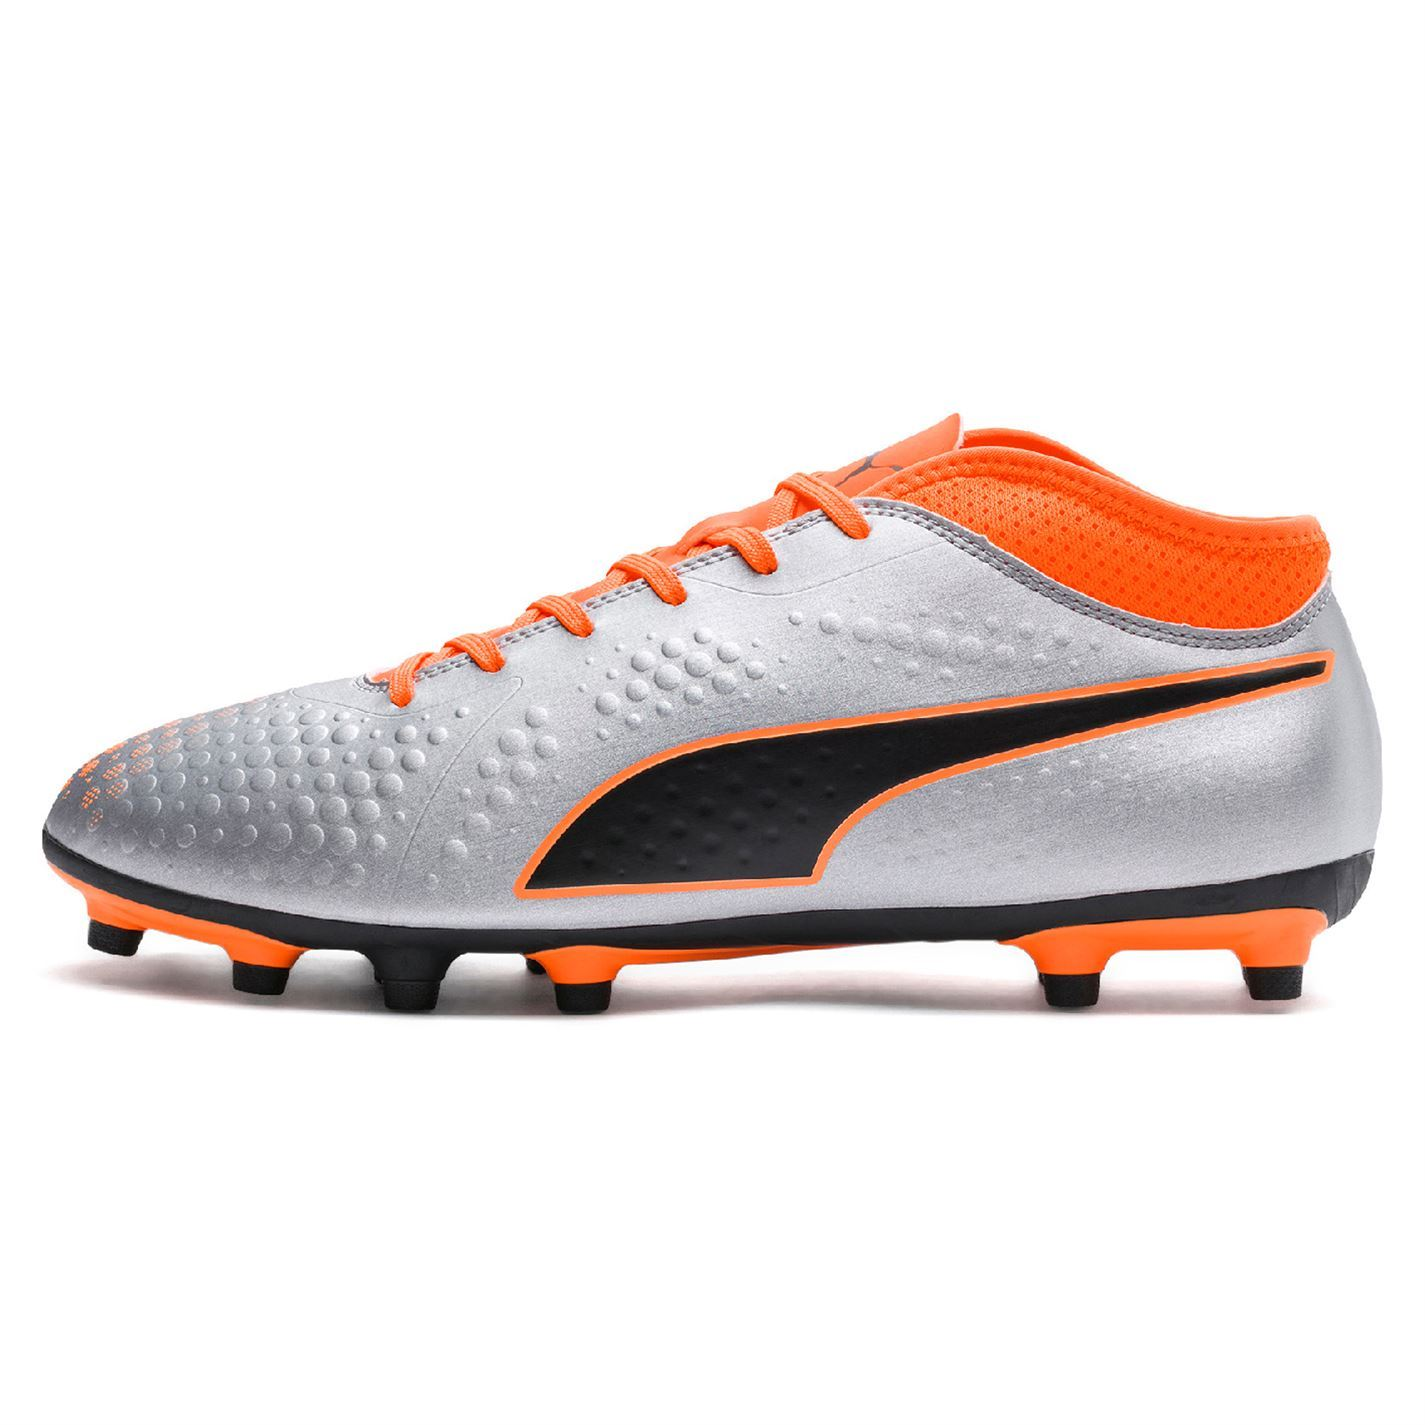 miniature 3 - Puma 4 FG Firm Ground Chaussures De Football Homme Football Chaussures Crampons